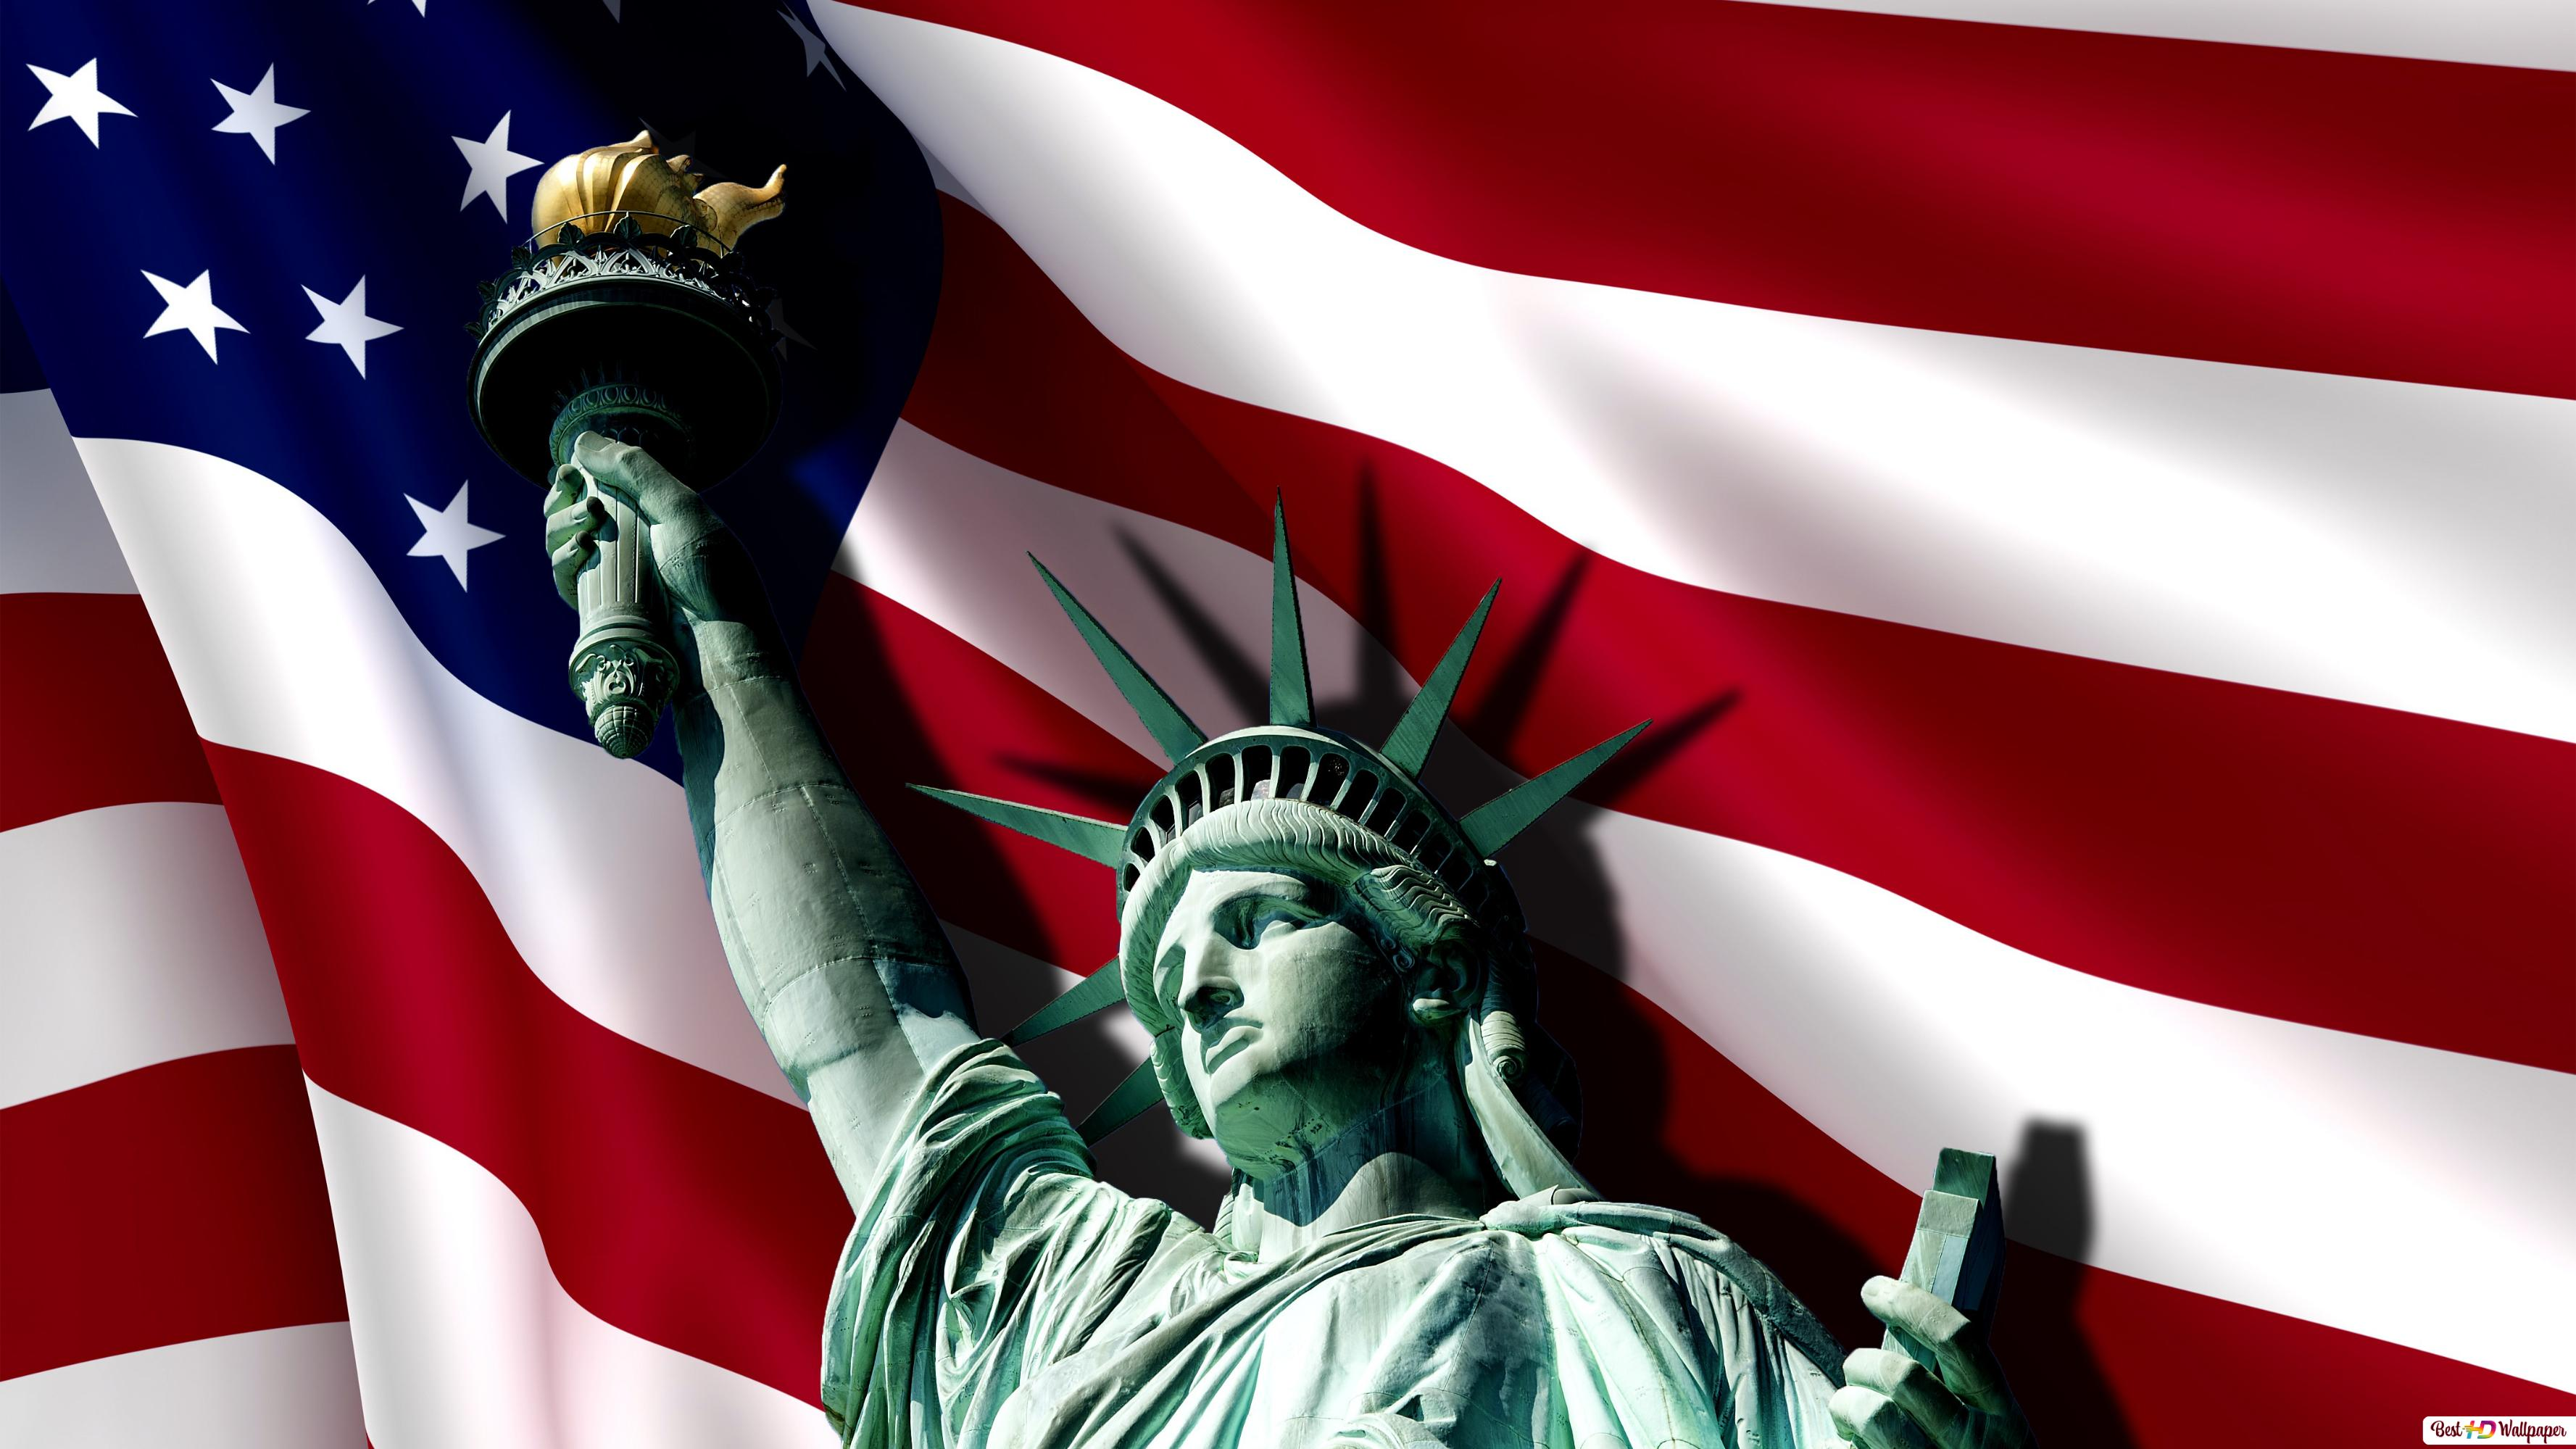 Descargar Fondo De Pantalla Estatua De La Libertad Dia De La